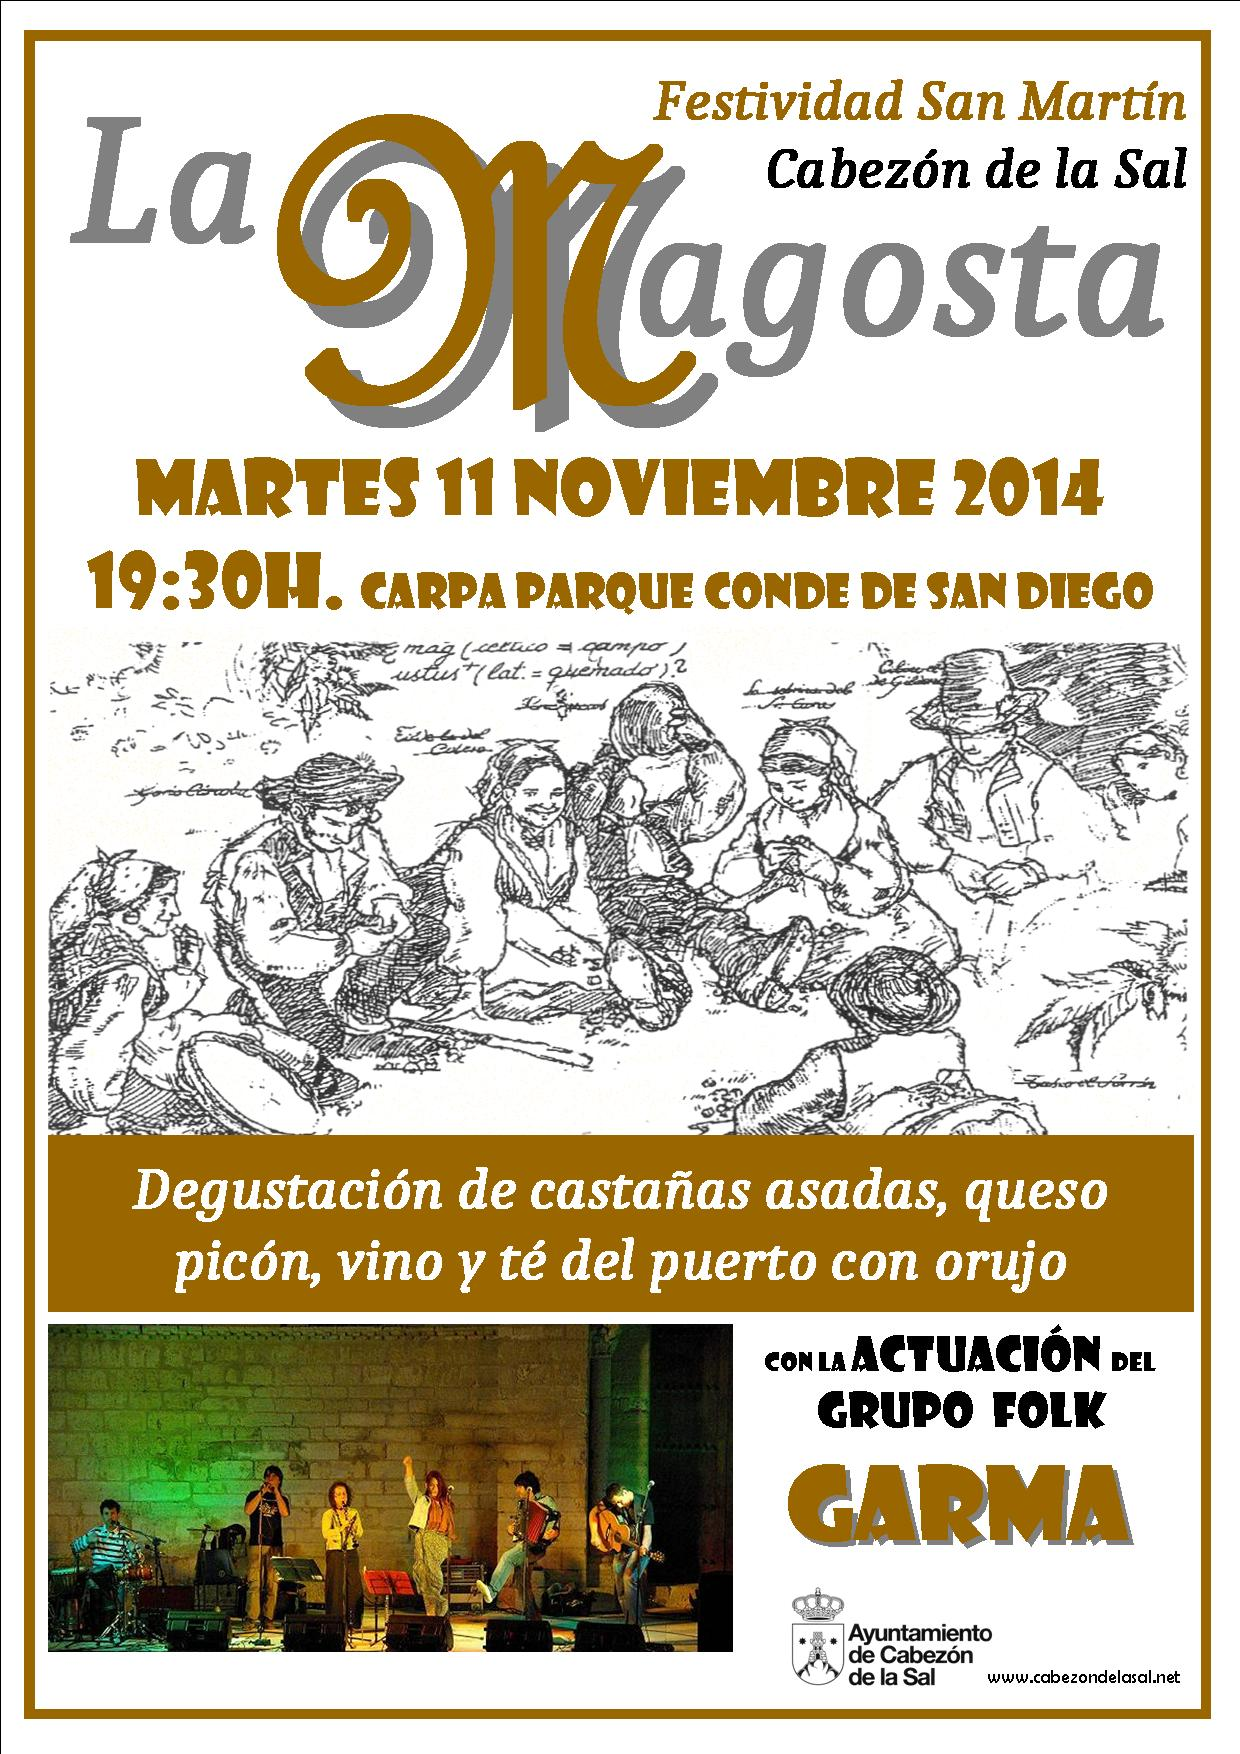 http://www.cabezondelasal.net/wp-content/uploads/2014/11/cartel-MAGOSTA-2014-2.jpg